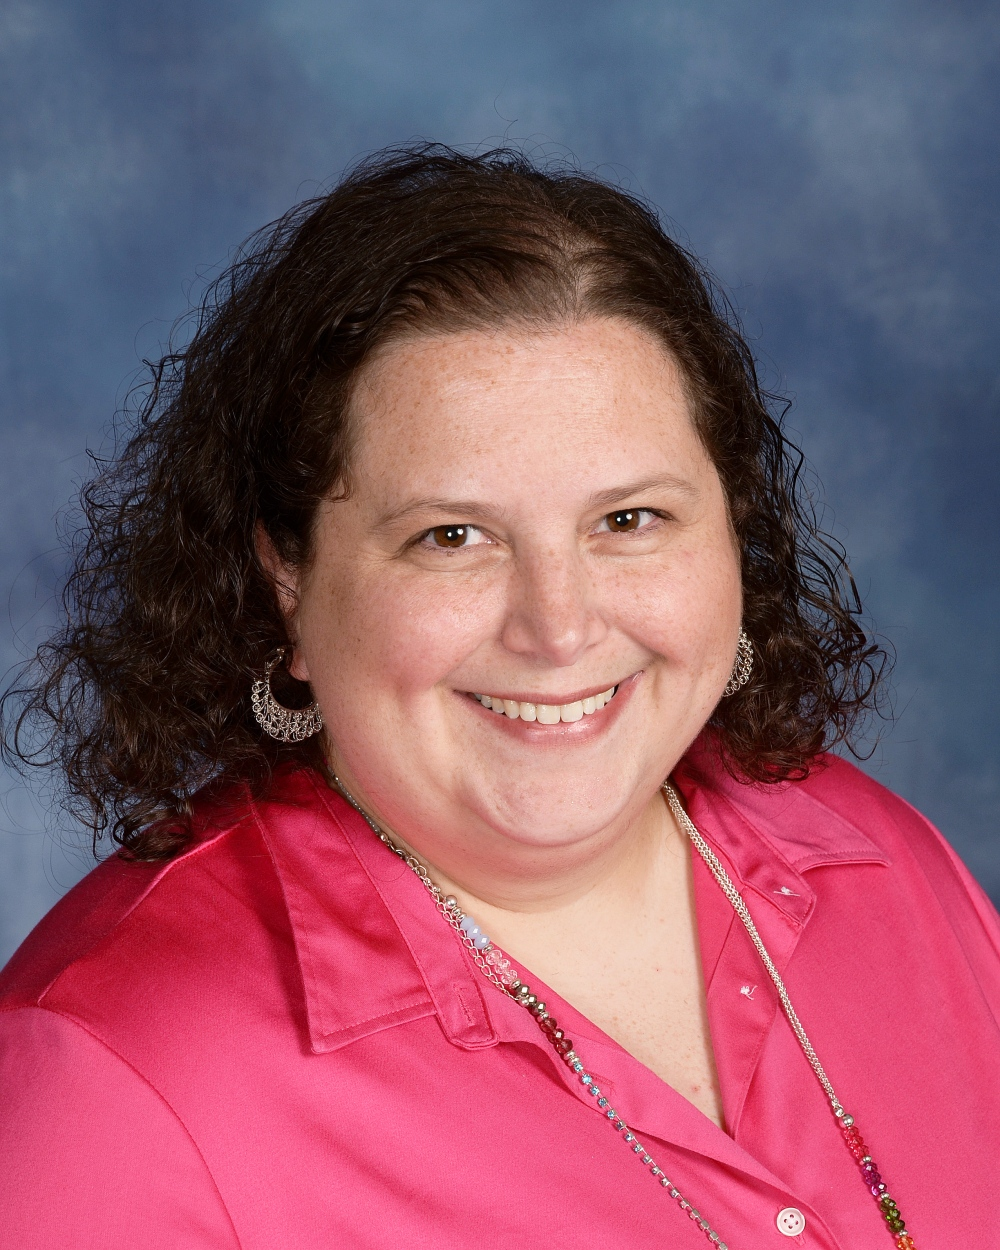 Lucinda Gibson  Director of Children's Ministries  LucindaGibson@fbcbremen.org